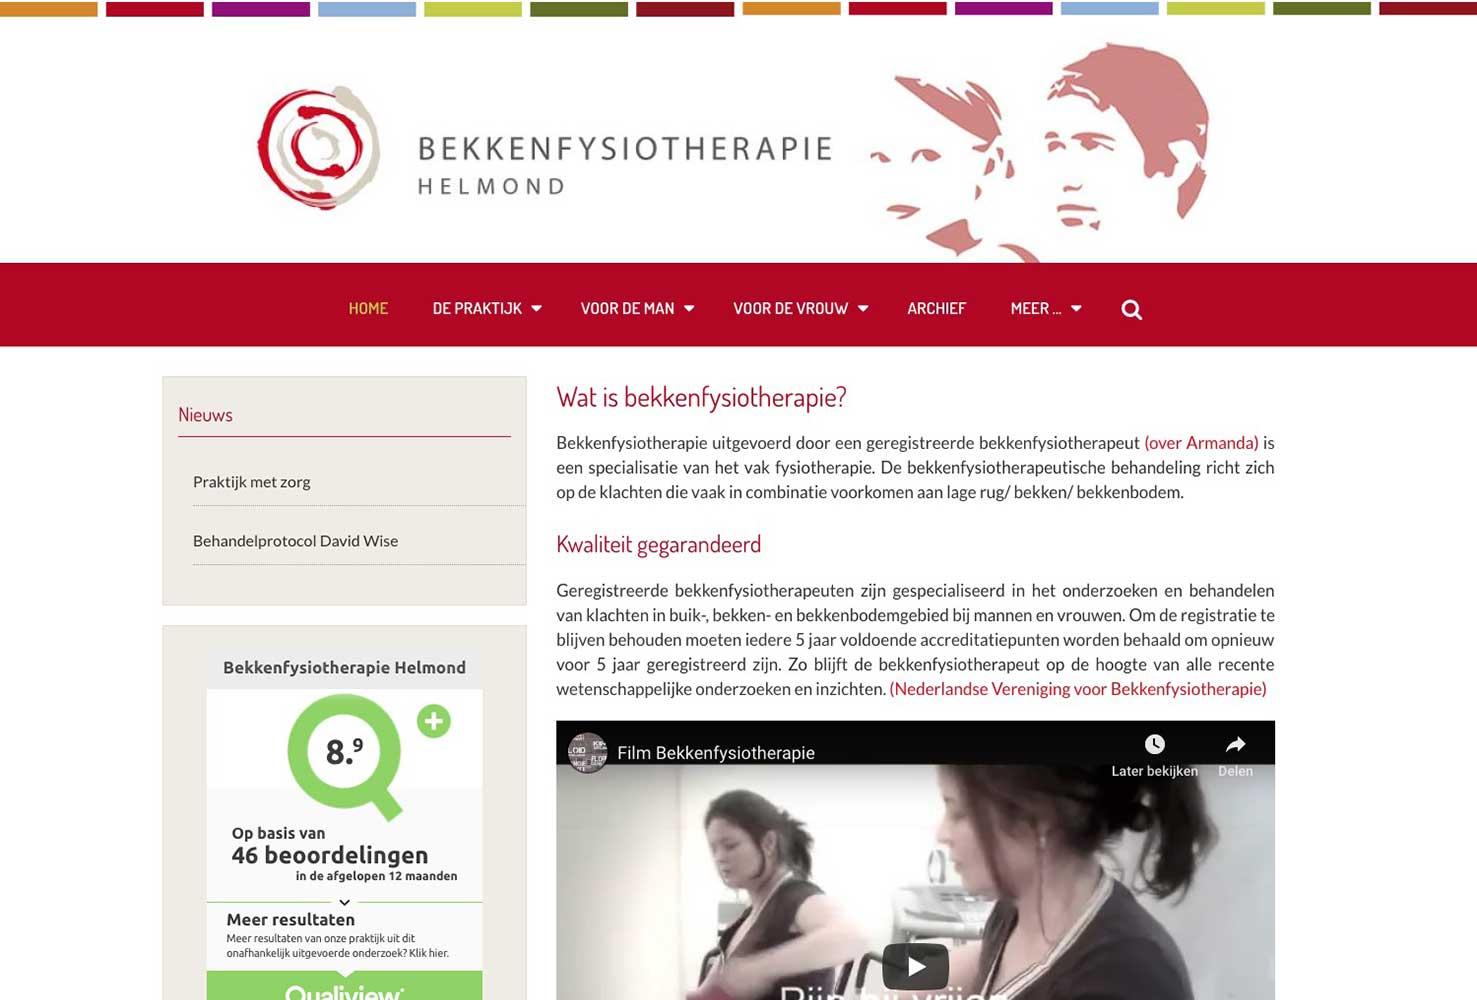 Bekkenfysiotherapie Helmond